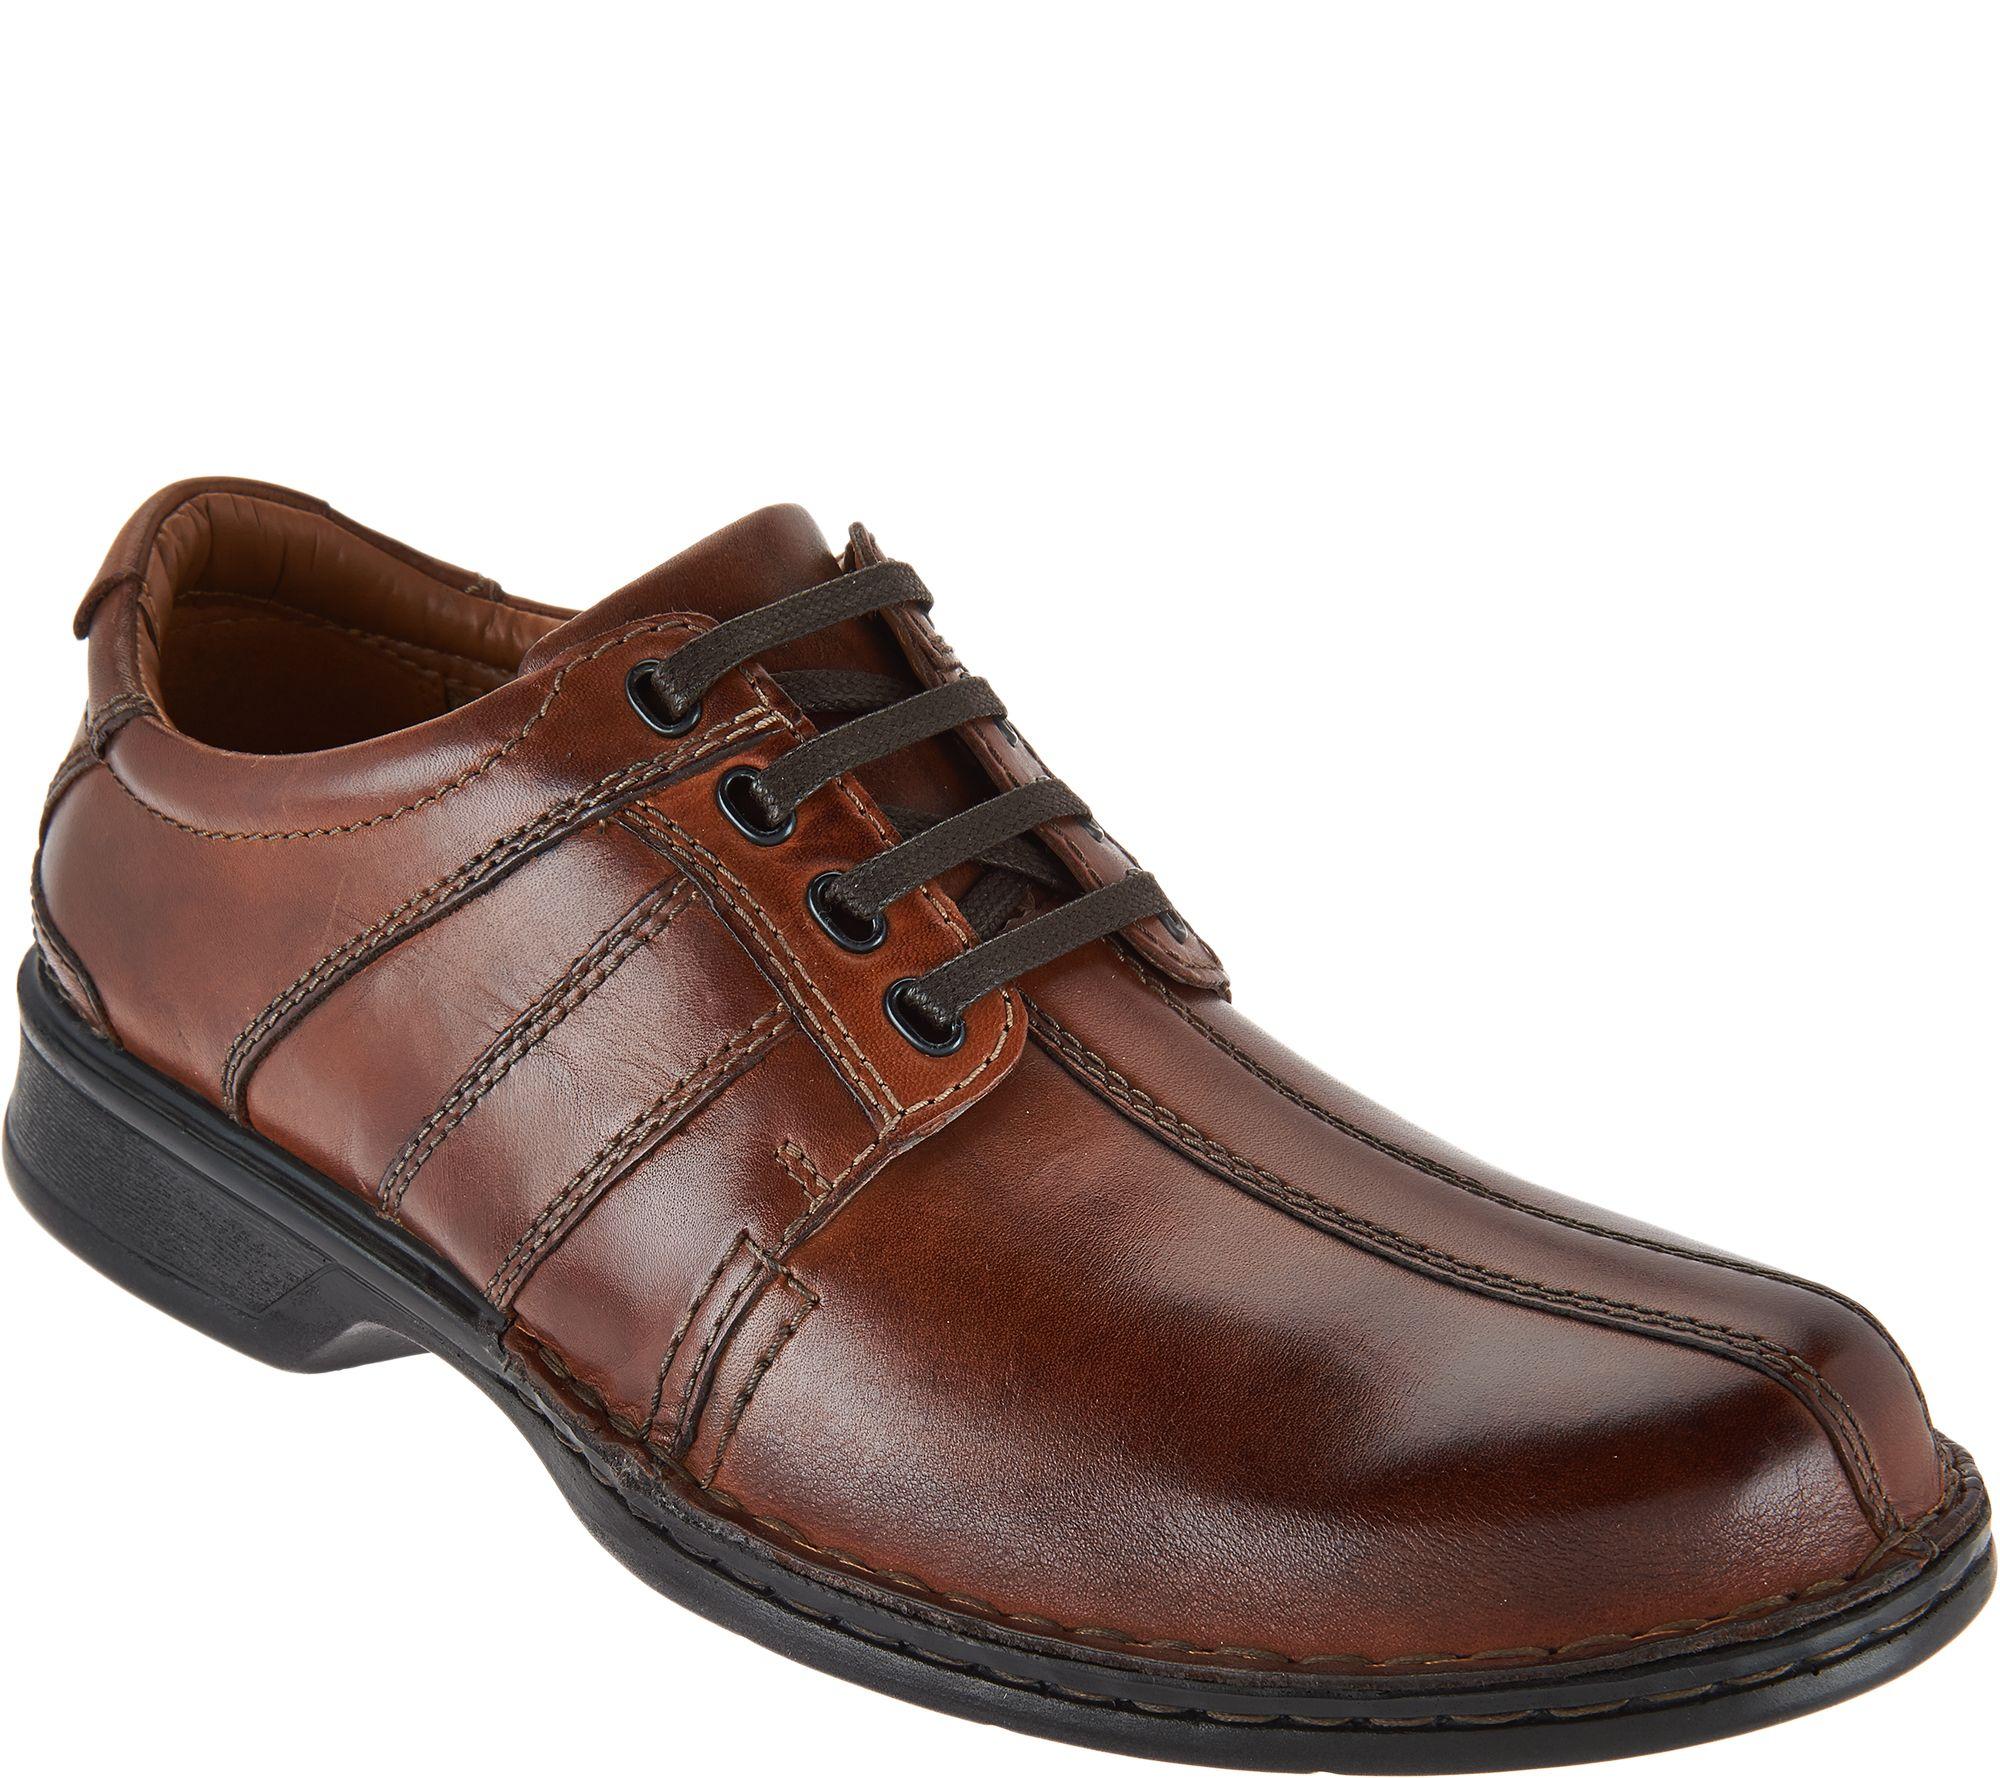 Clarks Men's Leather Lace-up Shoes - Touareg Vibe - A297379